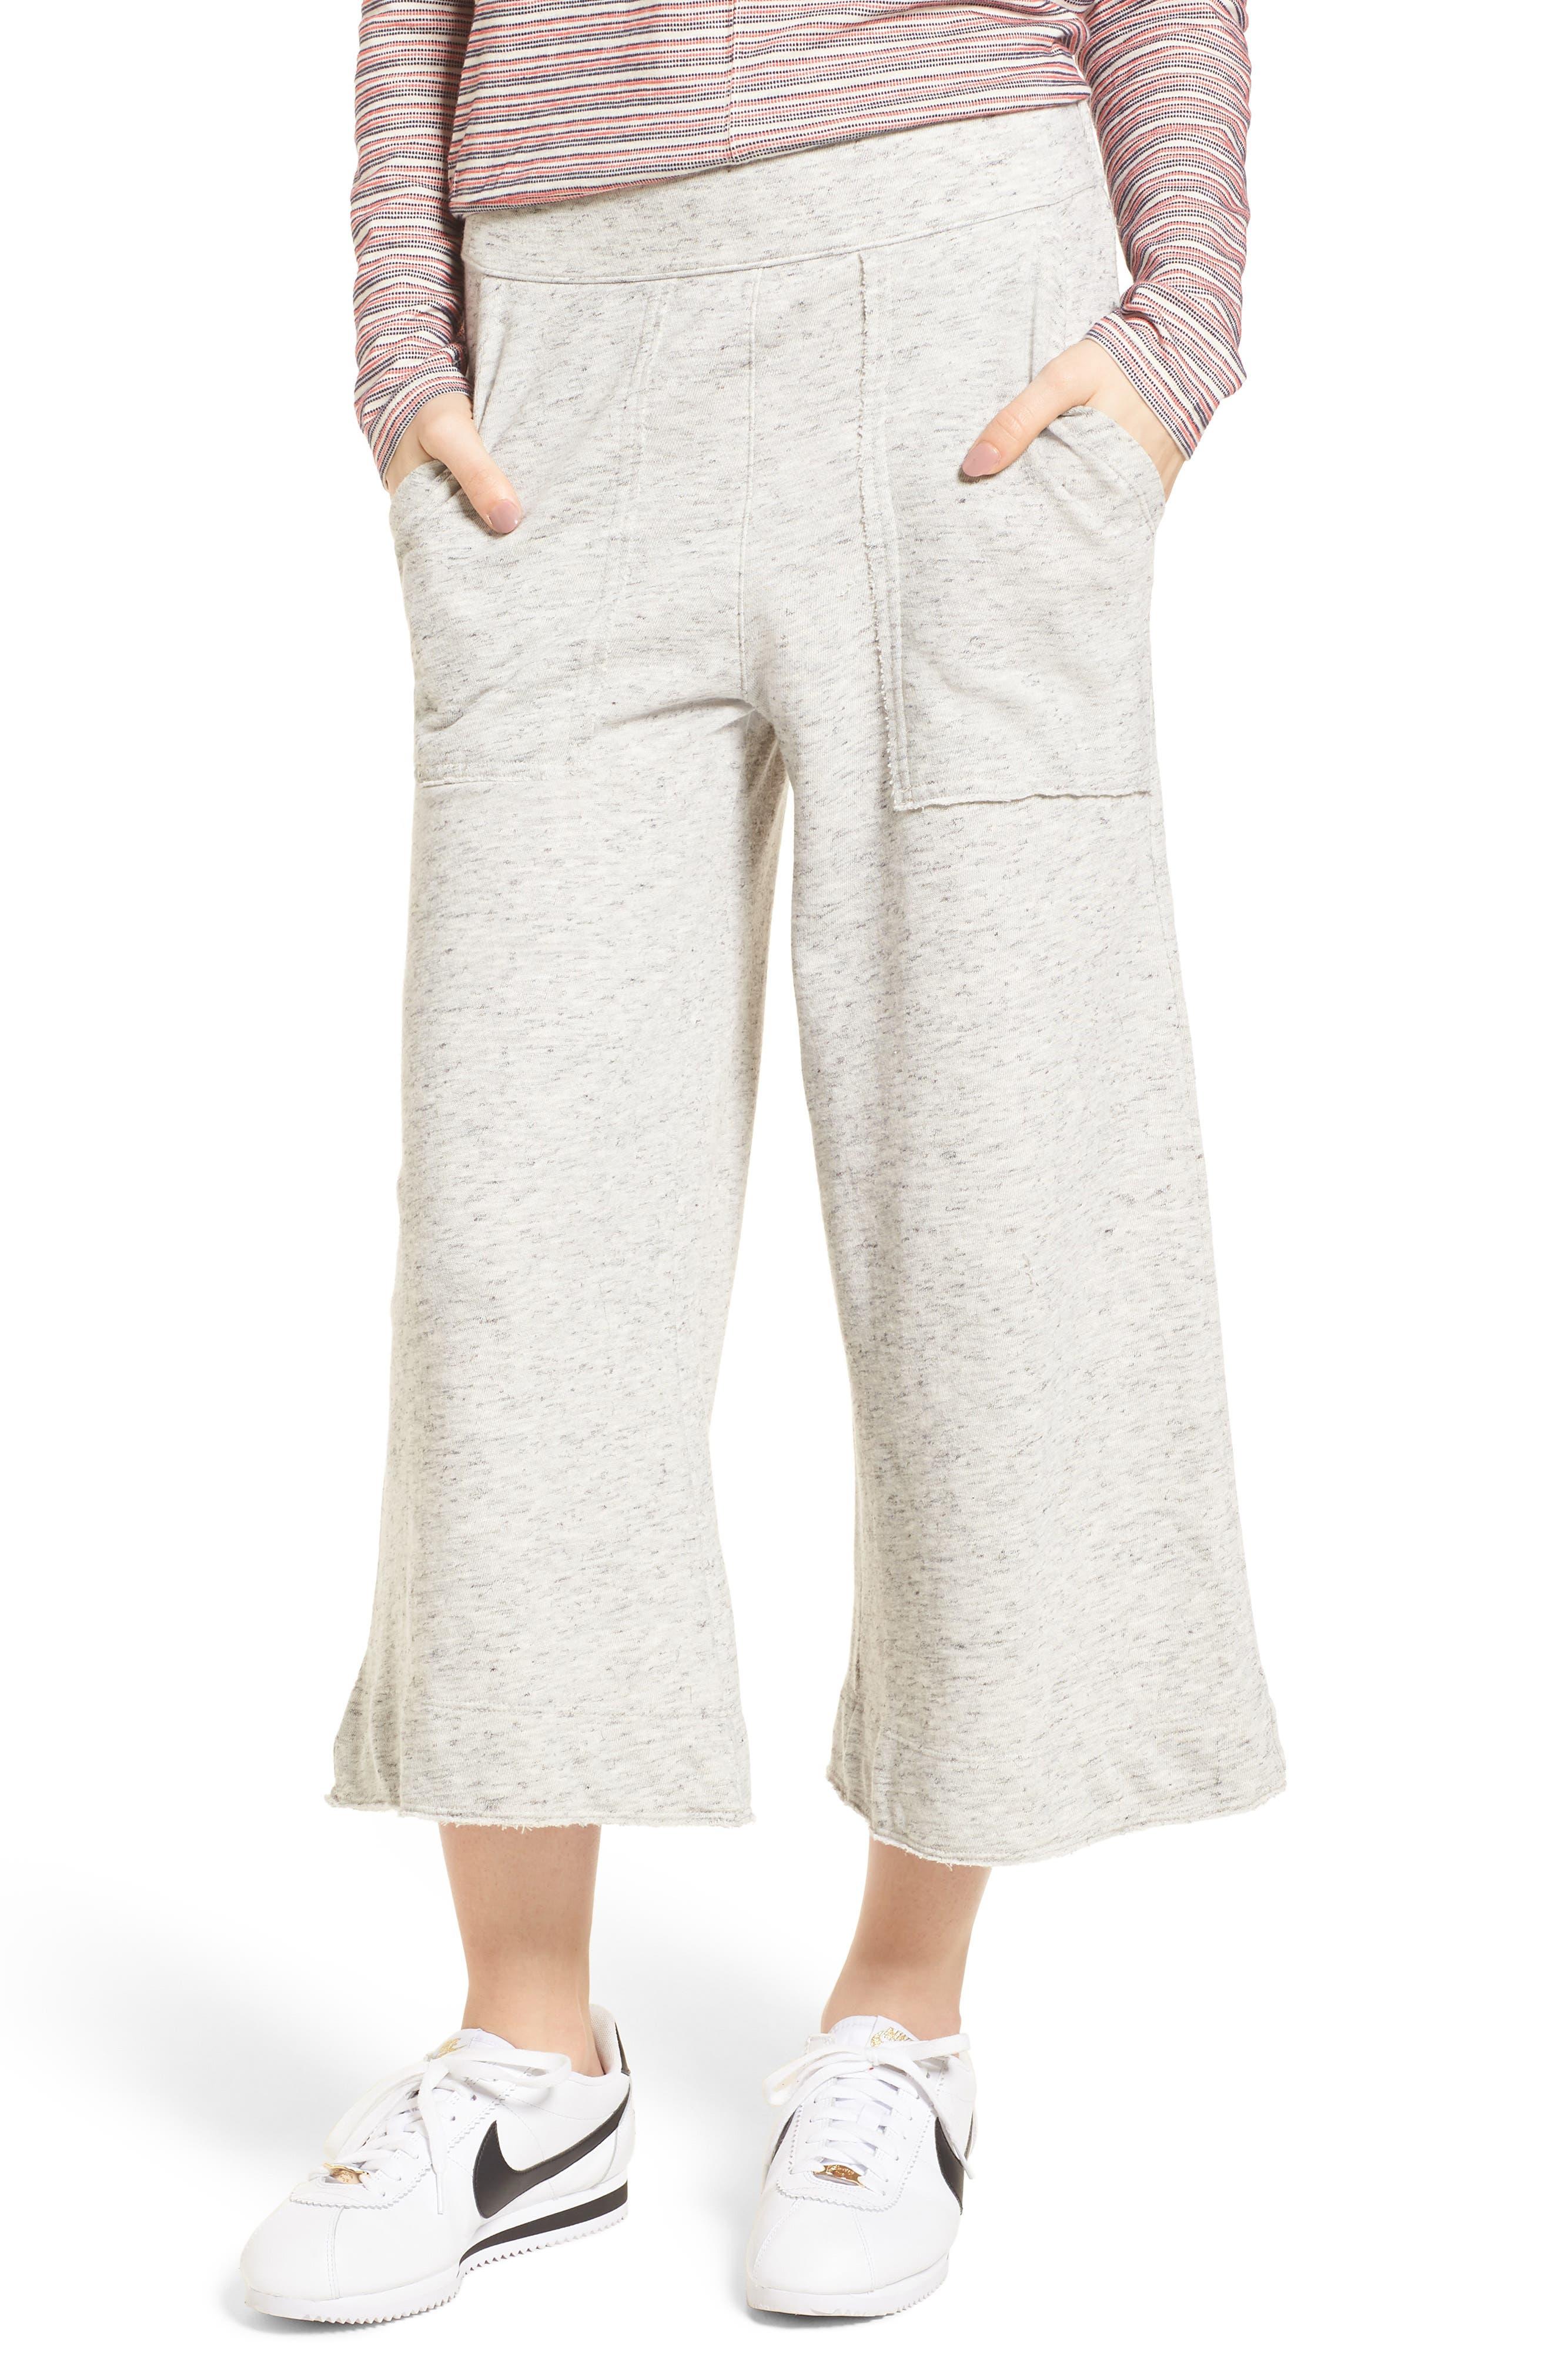 Sidelight Culotte Sweatpants,                             Main thumbnail 1, color,                             Grey